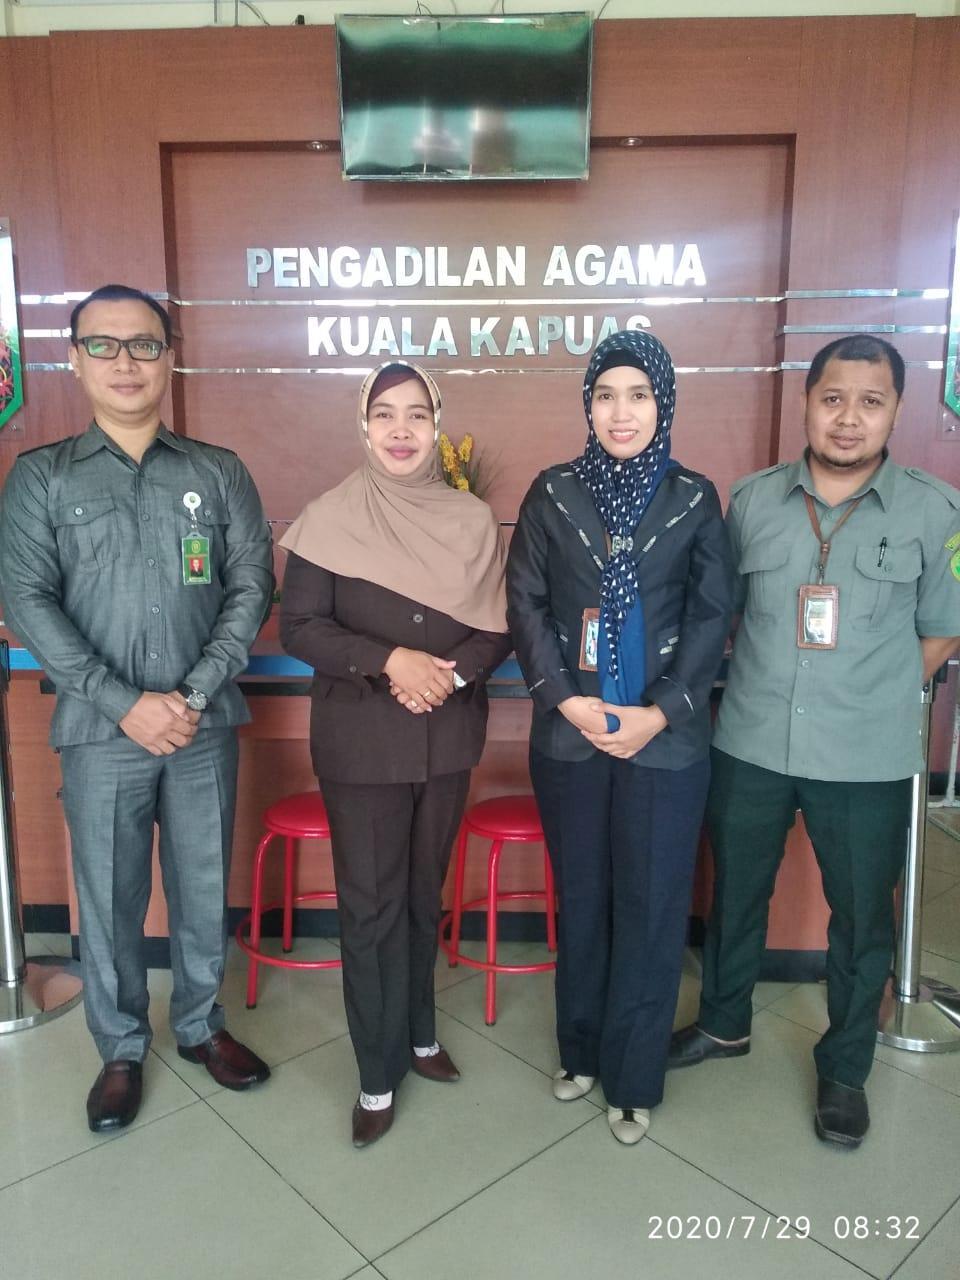 Inilah Agen Perubahan (Agent of Change) Pengadilan Agama Kuala Kapuas  | (24/9)